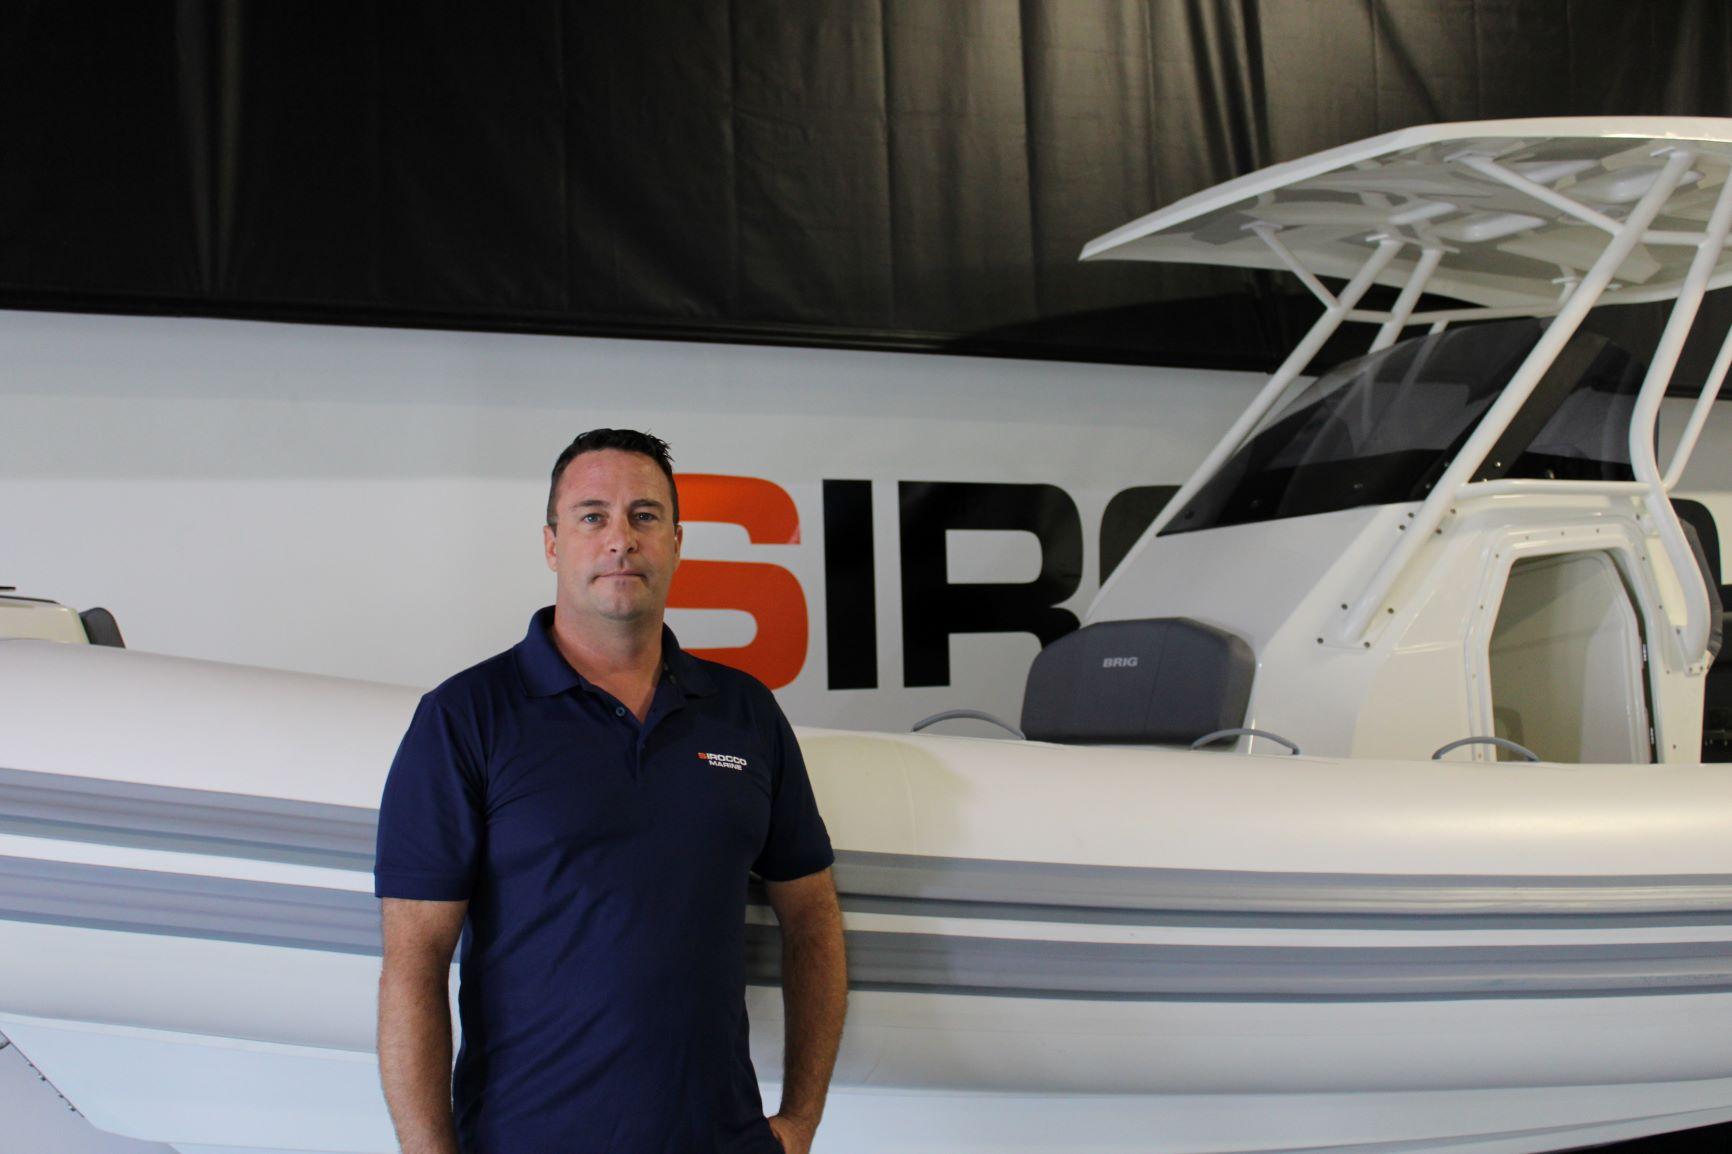 Member News - Sirocco Marine